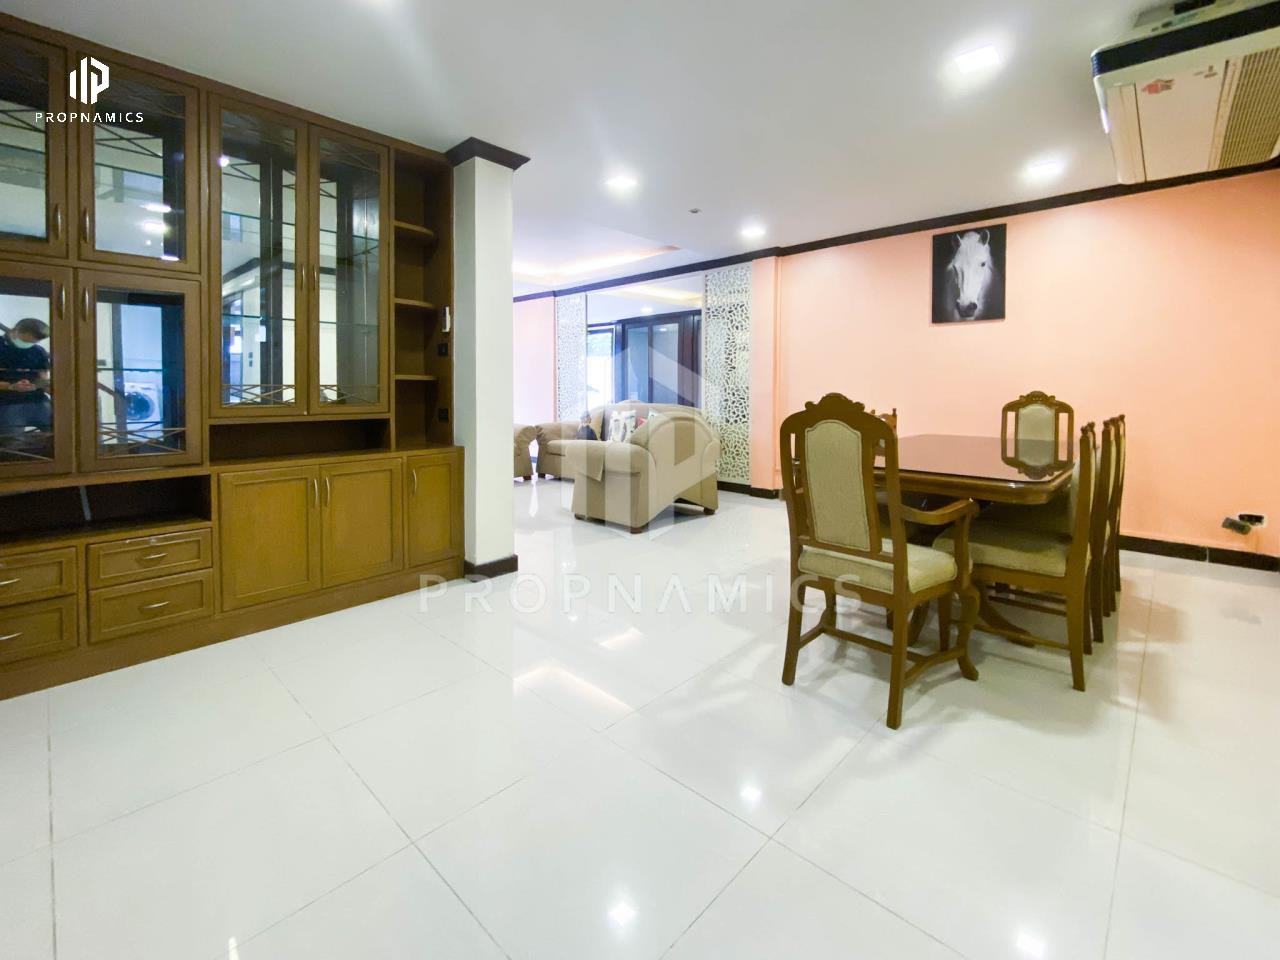 Propnamics Co., Ltd Agency's FOR RENT: SINGLE HOUSE IN SUKHUMVIT 26 12